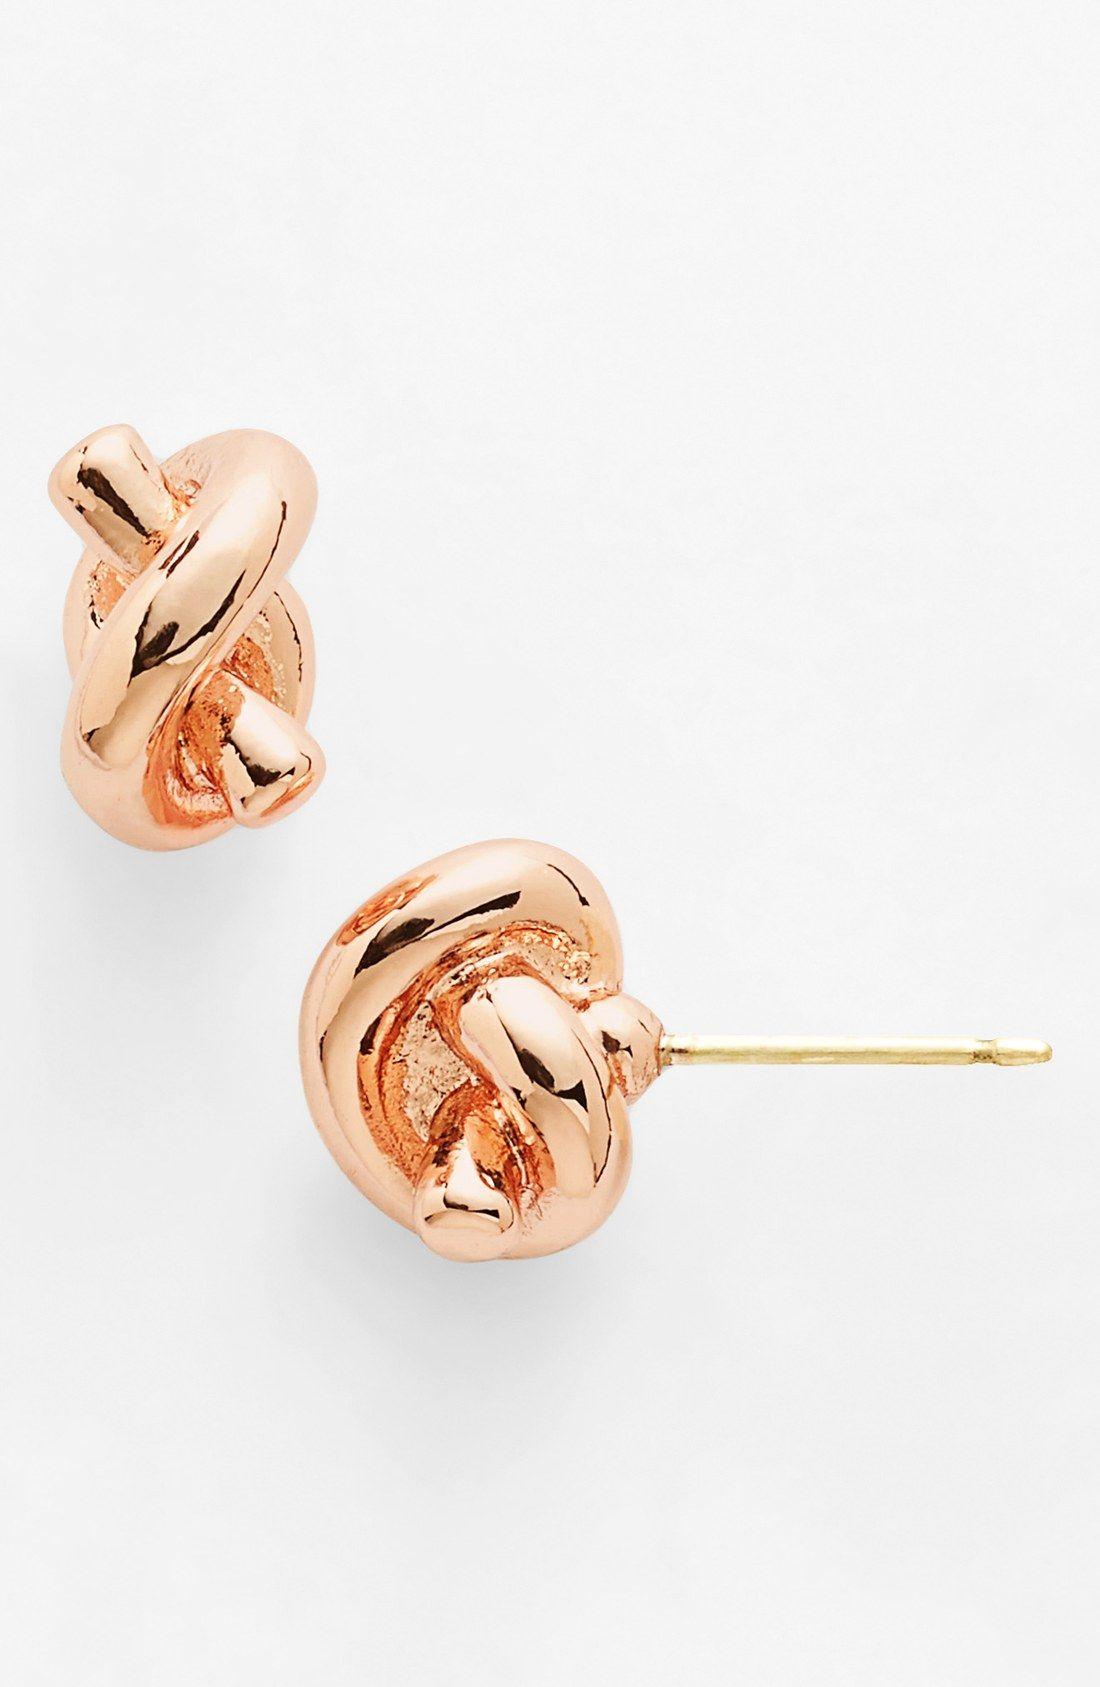 Kate Spade New York Sailors Knot Mini Stud Earrings Nordstrom Kate Spade Earrings Mini Studs Sailor Knots